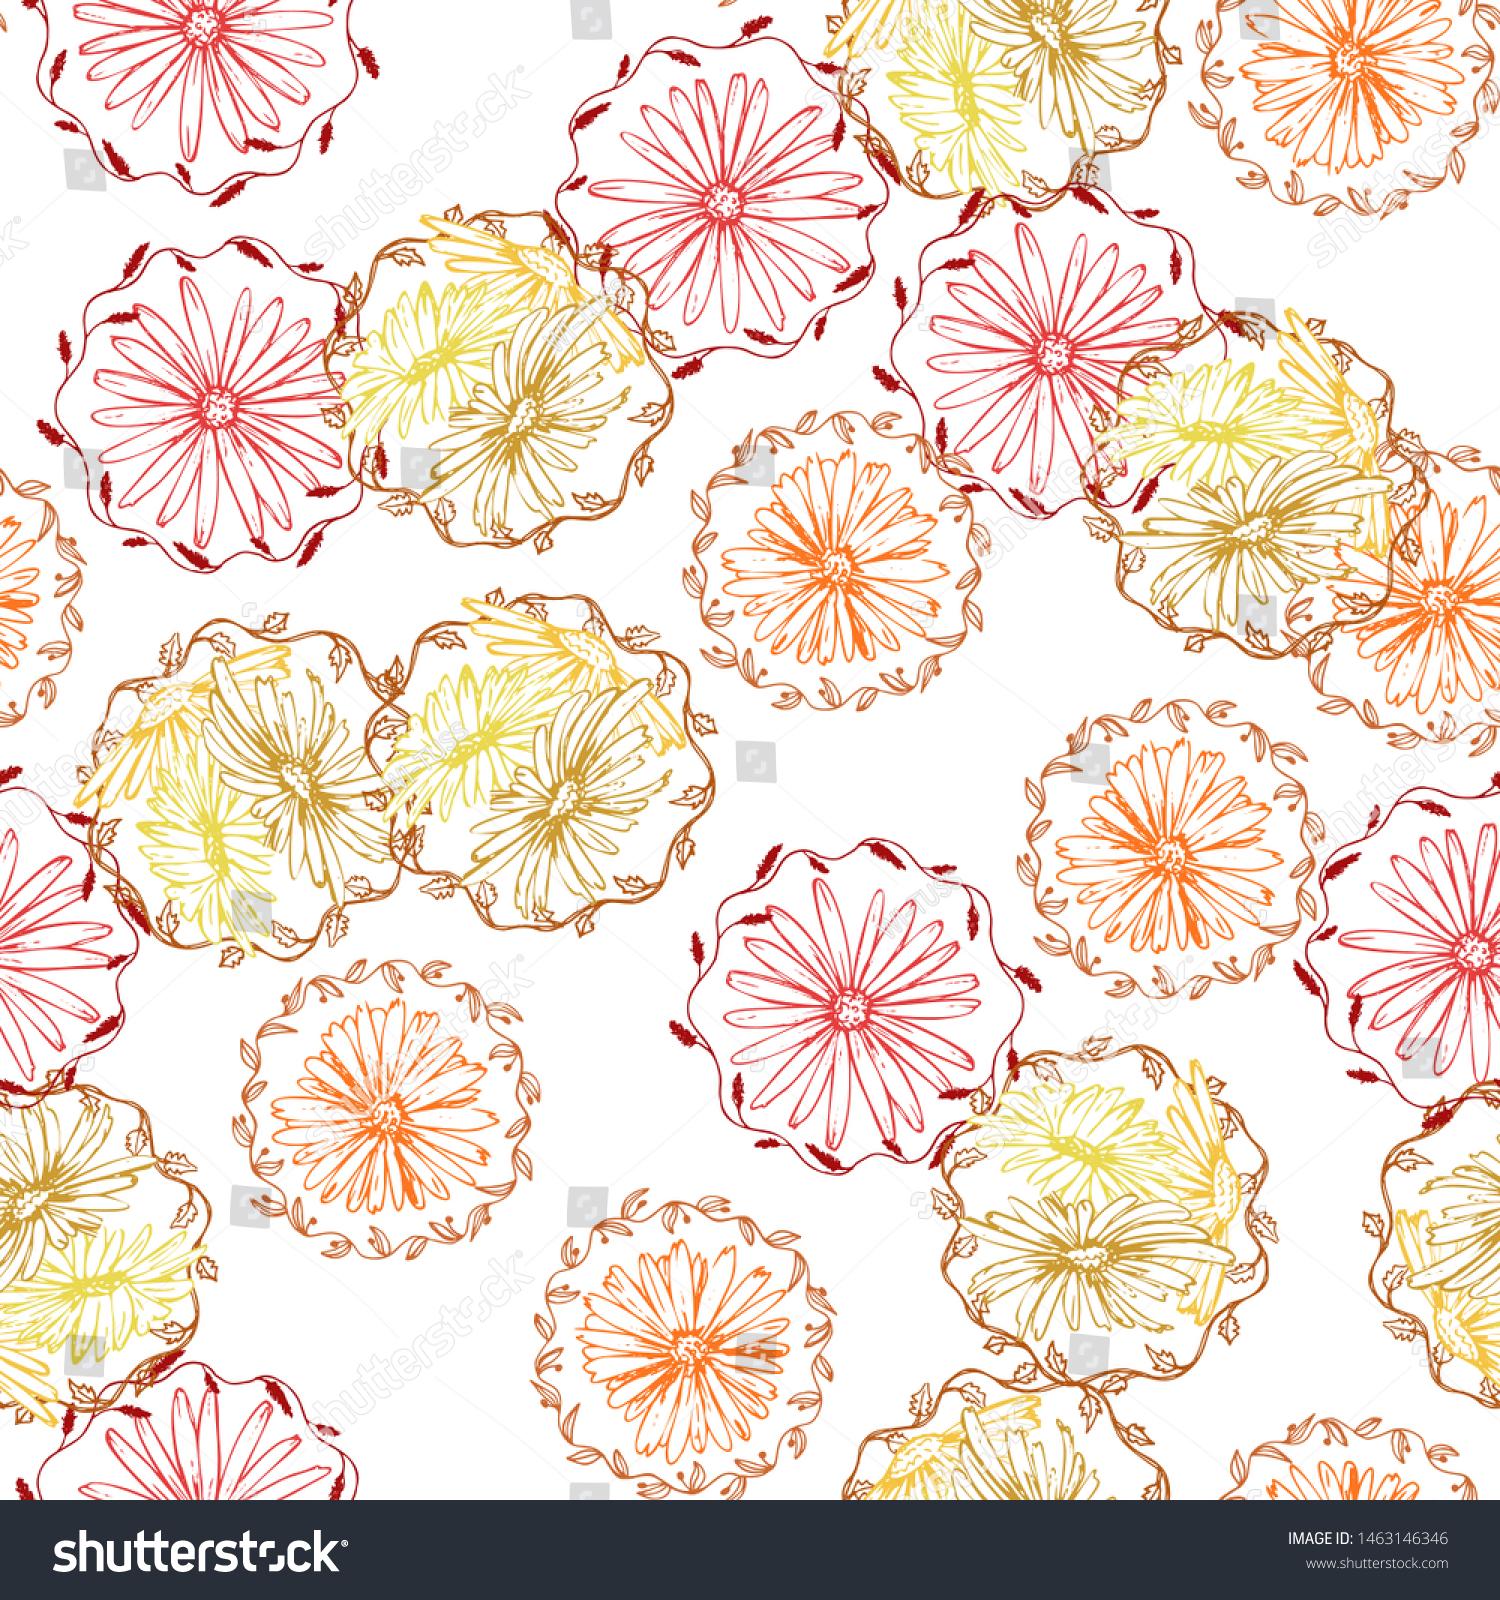 Retro Collection Fabric Wallpapercolorful Color Artsy Royalty